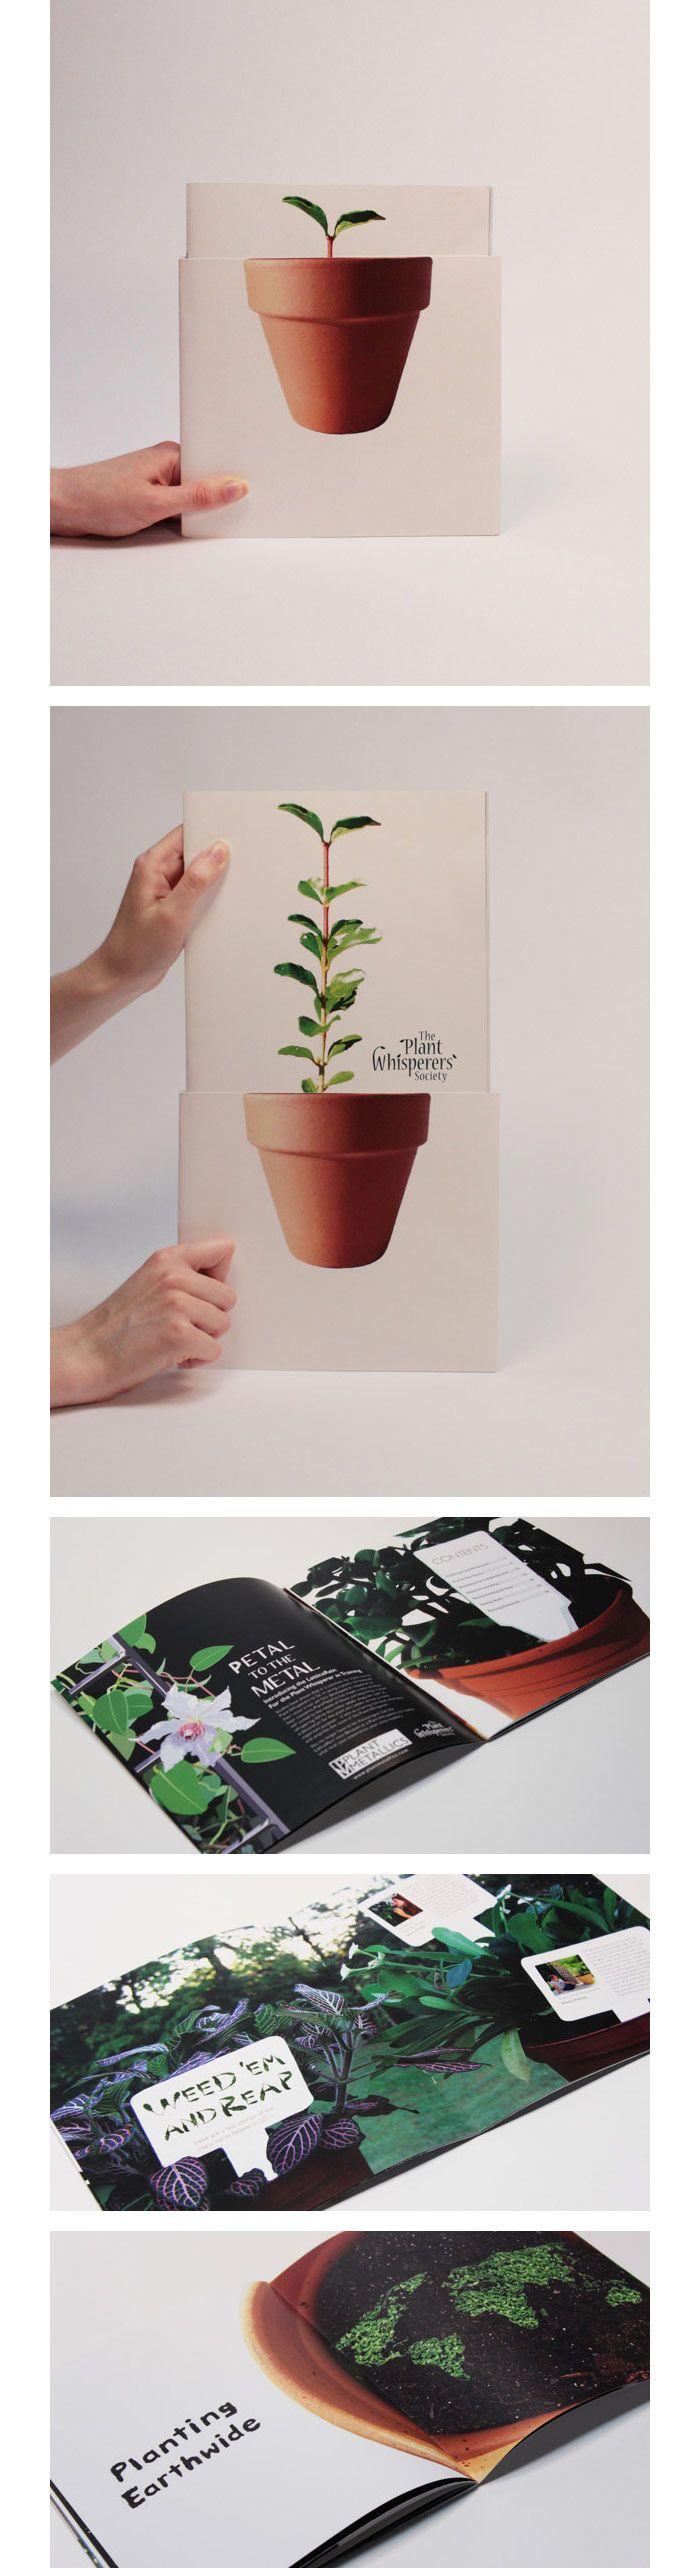 Alliteration Inspiration: Plants & Pizza